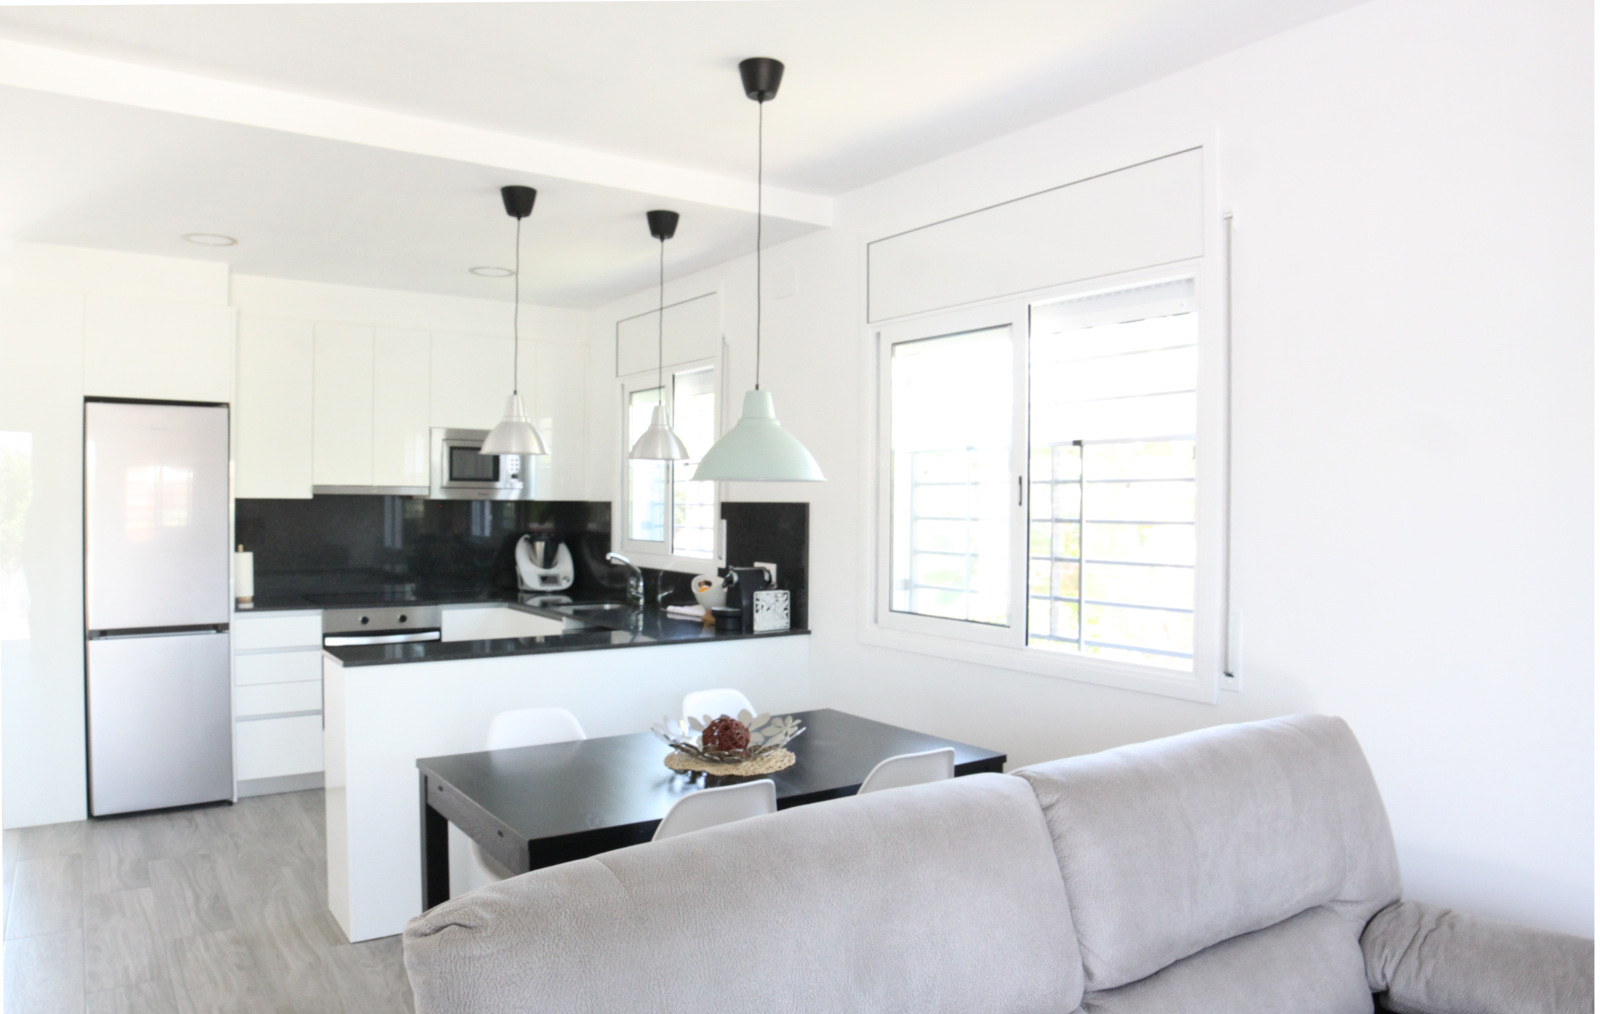 Vivienda unifamiliar en Bellvei del Penedés. Fotografia de la sala de estar-comedor-cocina.